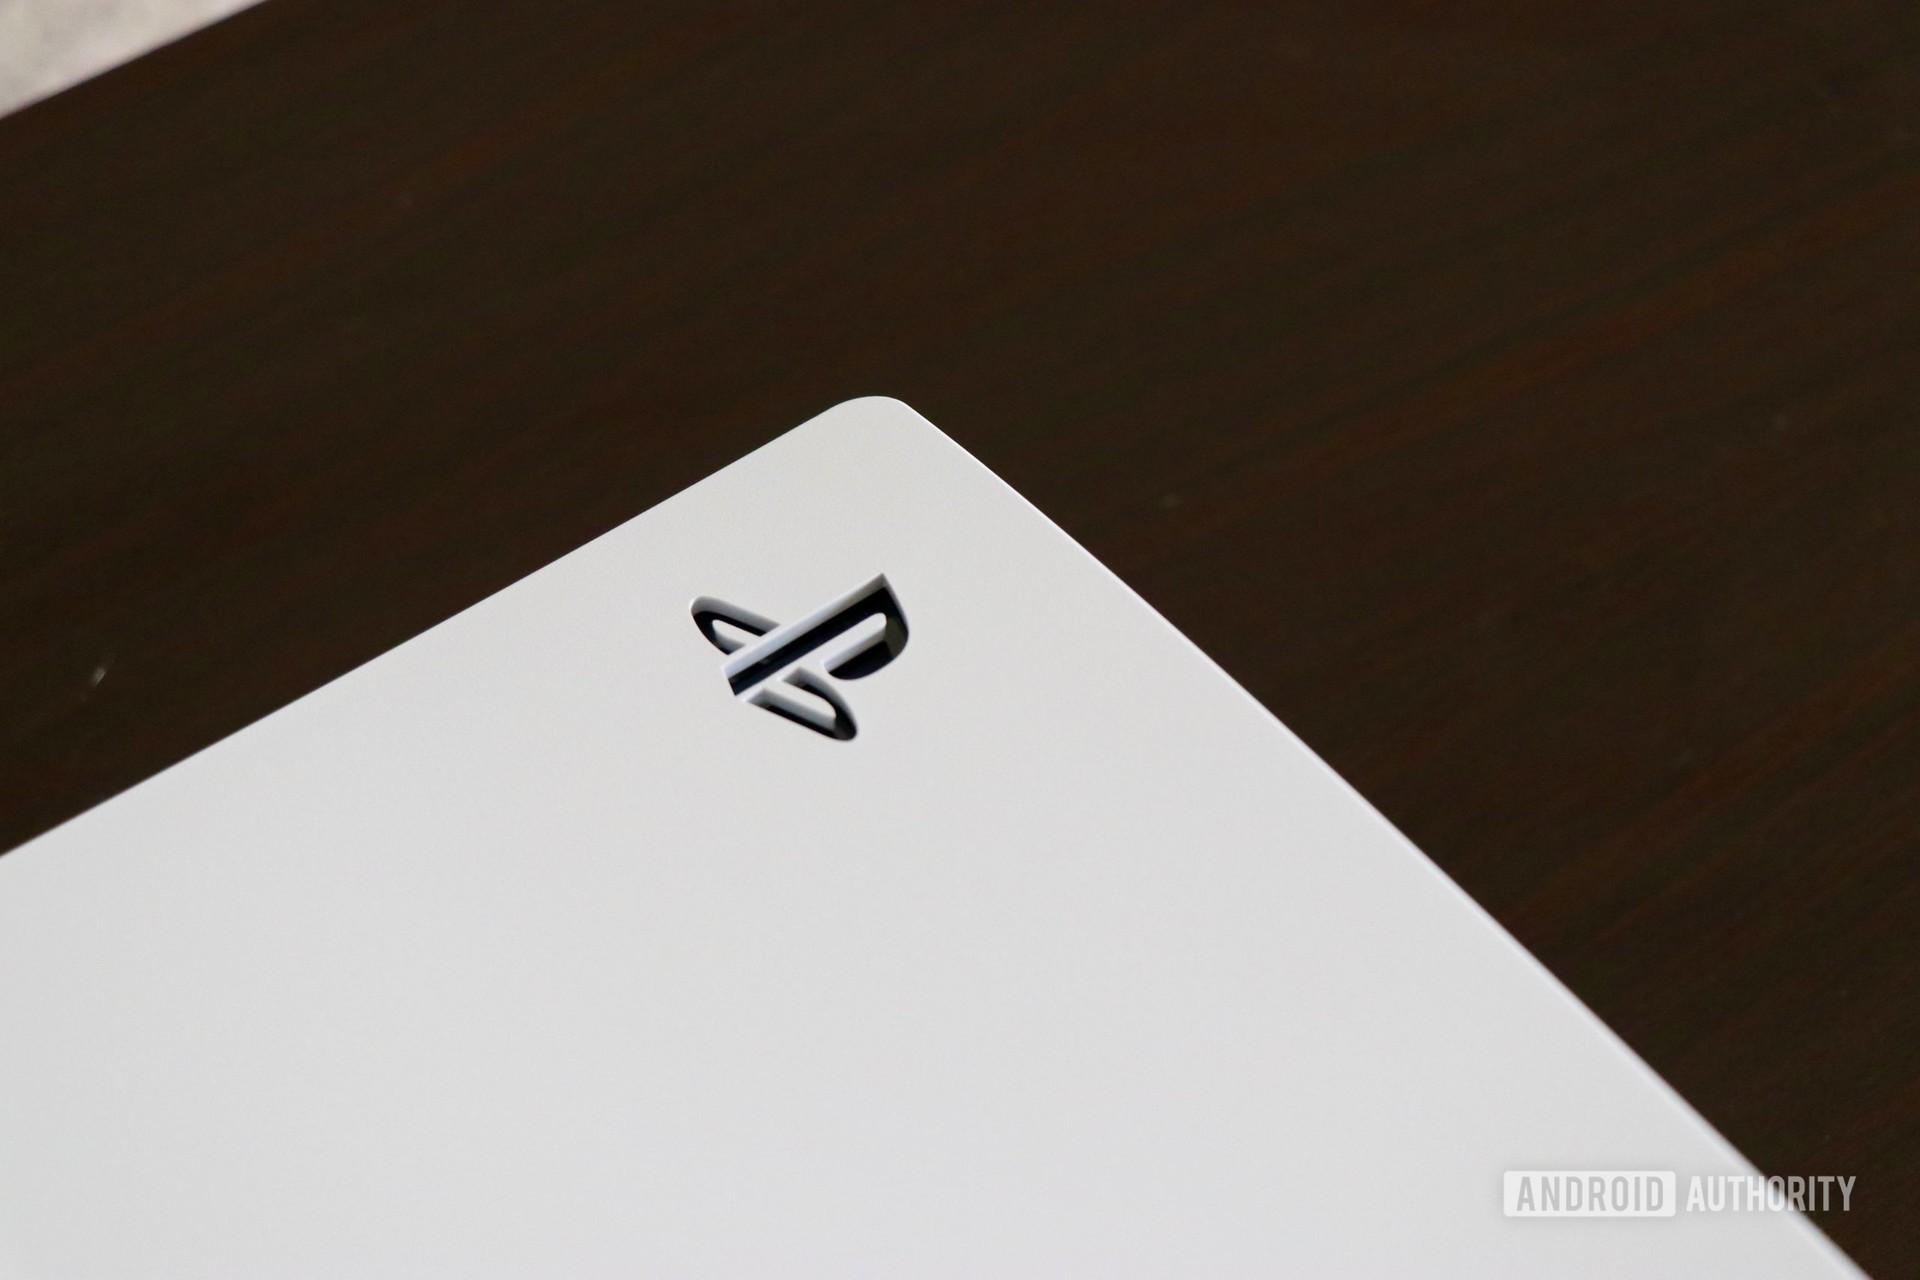 playstation logo close up on ps5